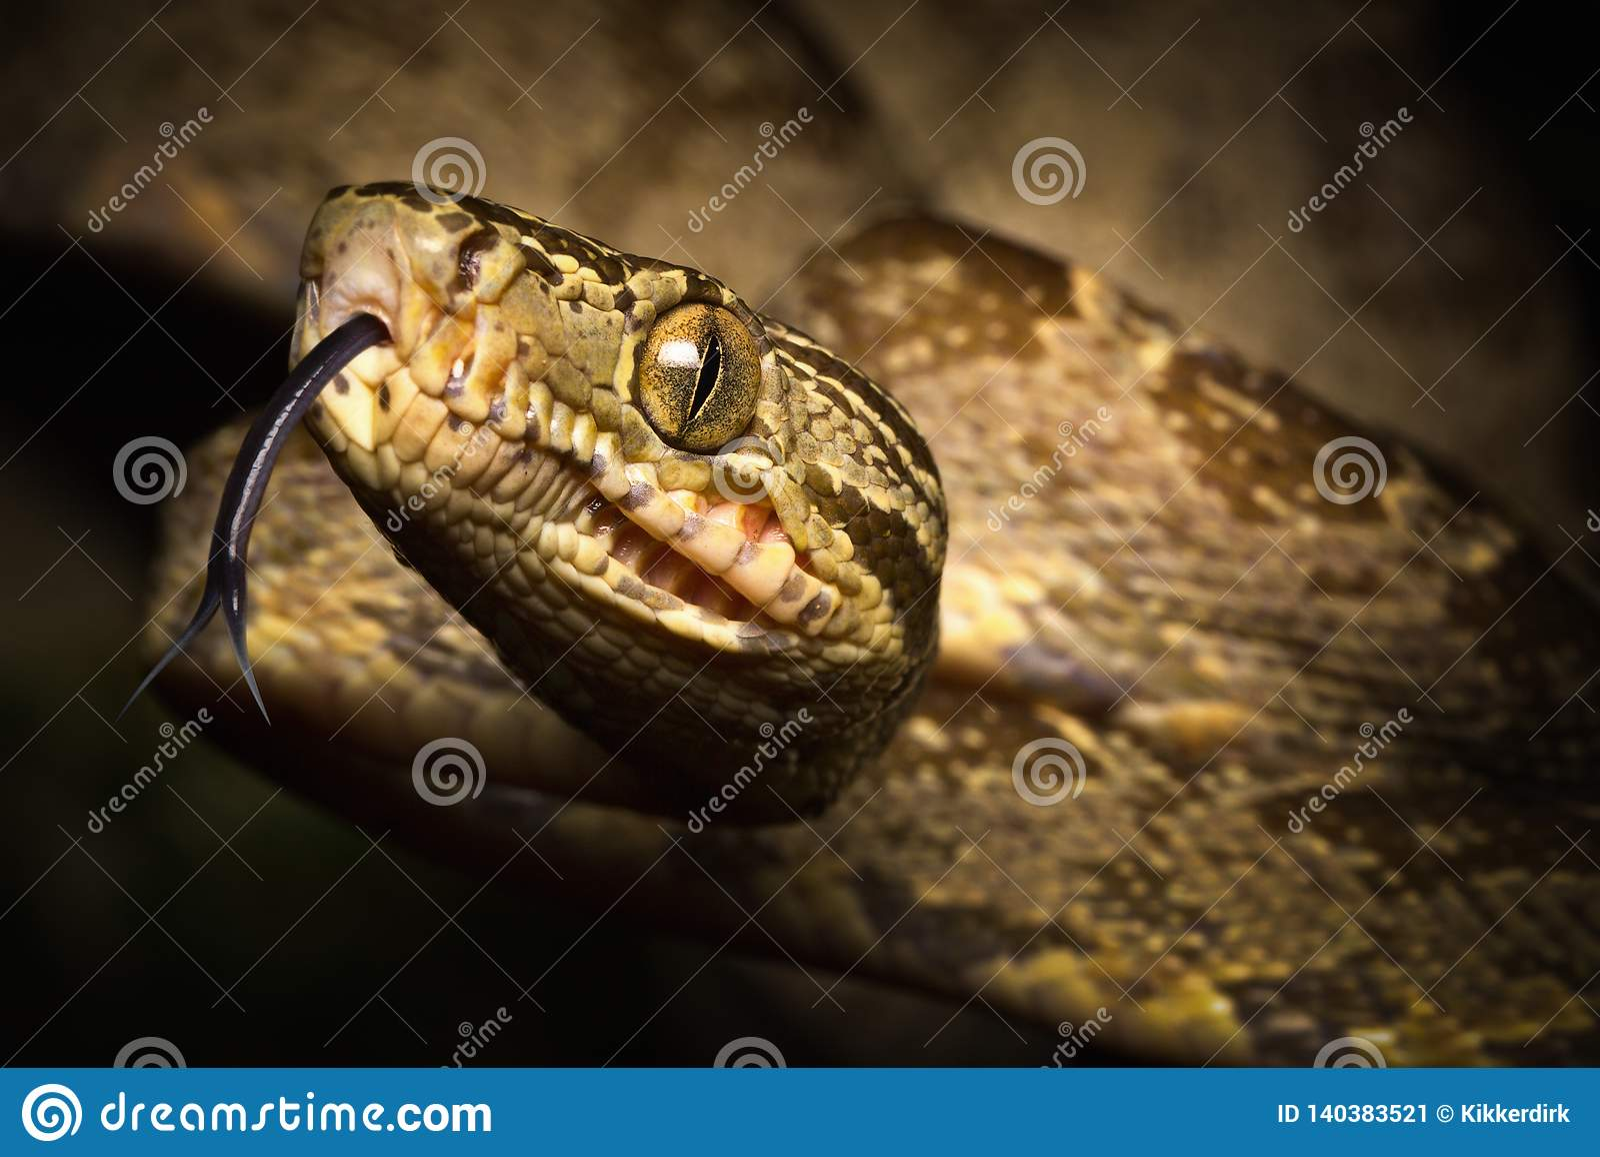 Tropische Schlange, Baumboa Corallus-hortulanus eine Schlange des Amazonas-Regenwaldes in Kolumbien